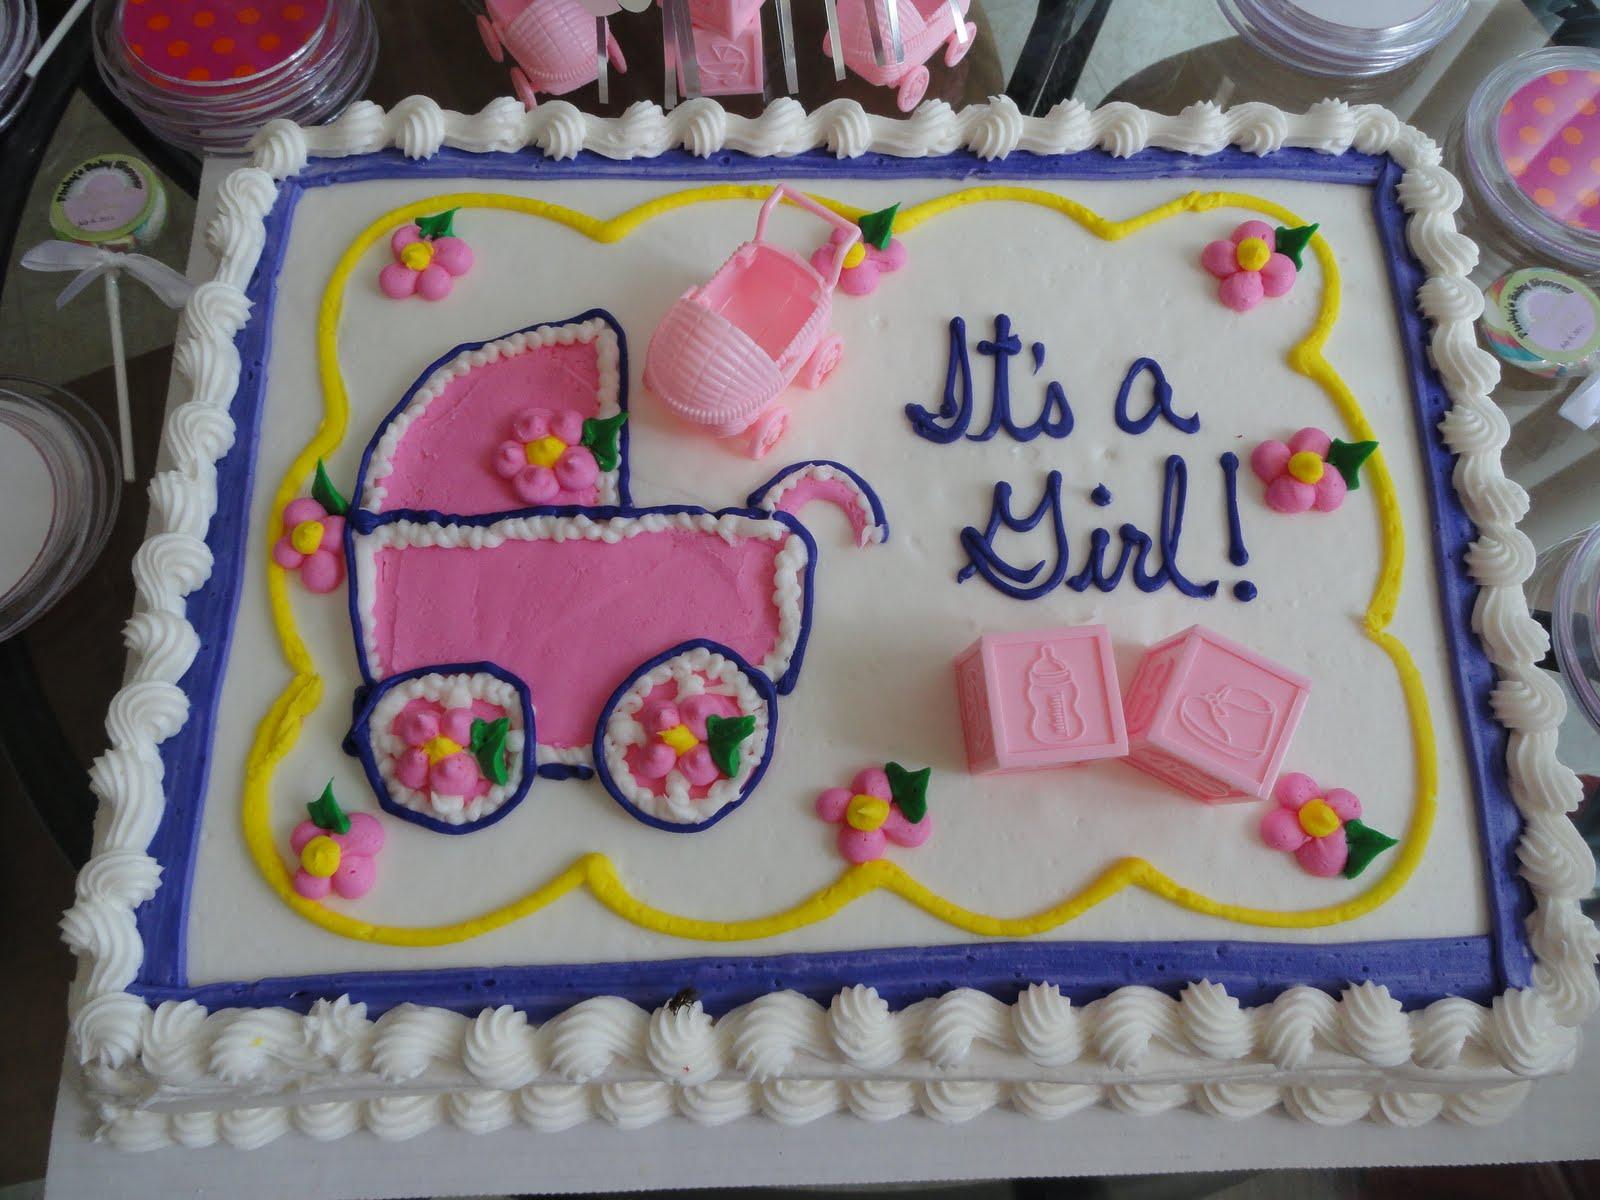 11 Costco Bakery Cakes Baby Photo Costco Baby Shower Cakes Costco